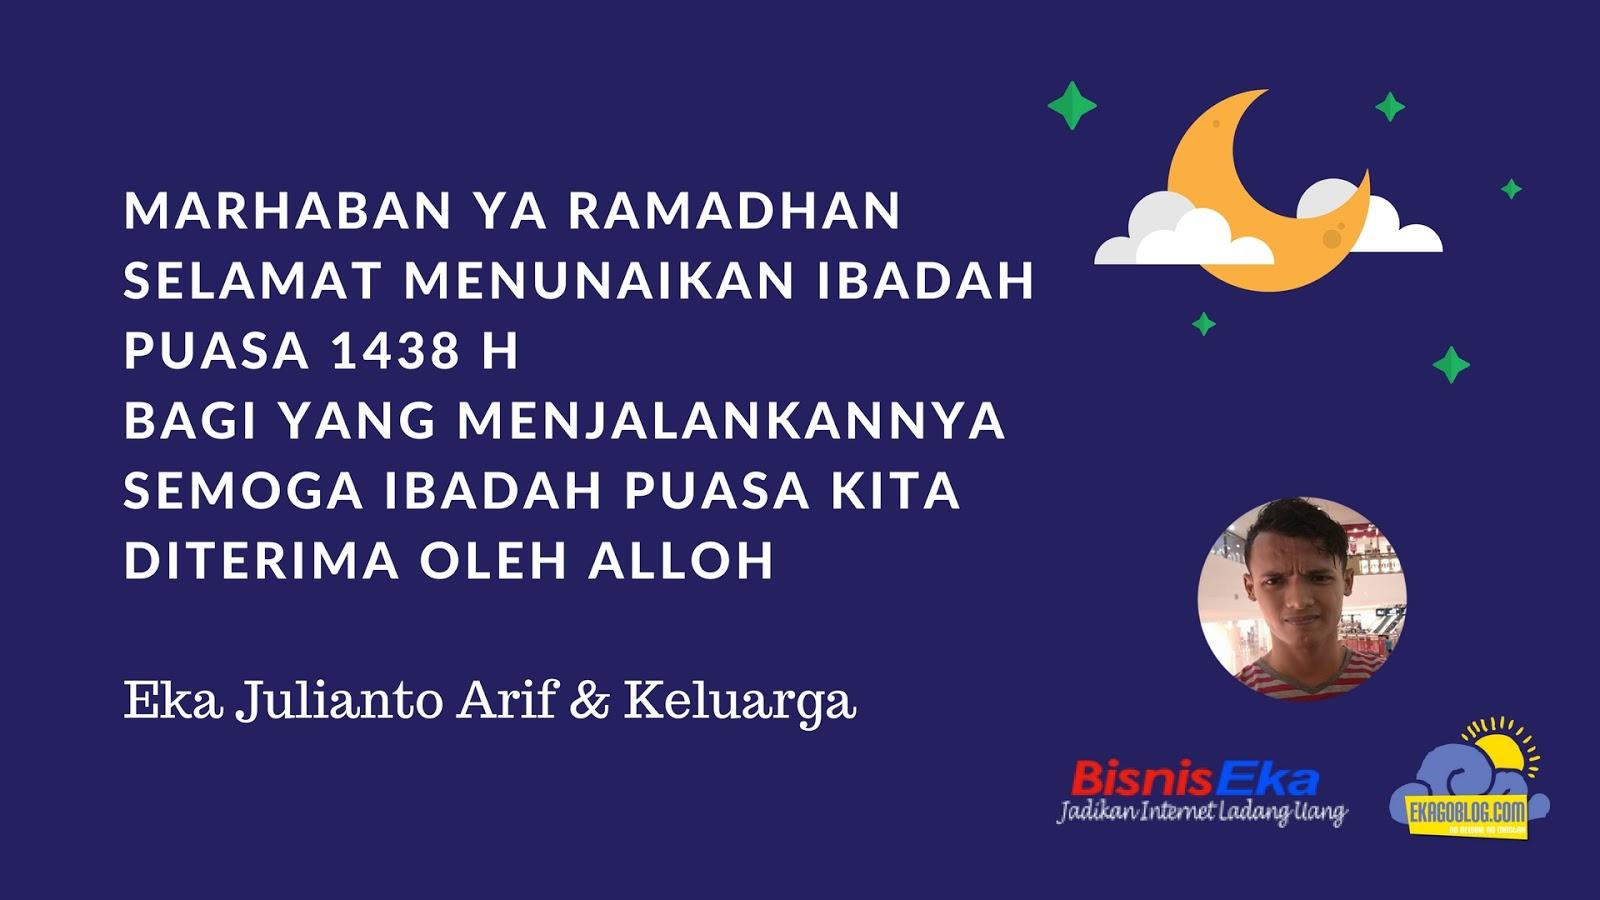 Marhaban Ya Ramadhan 1438 H